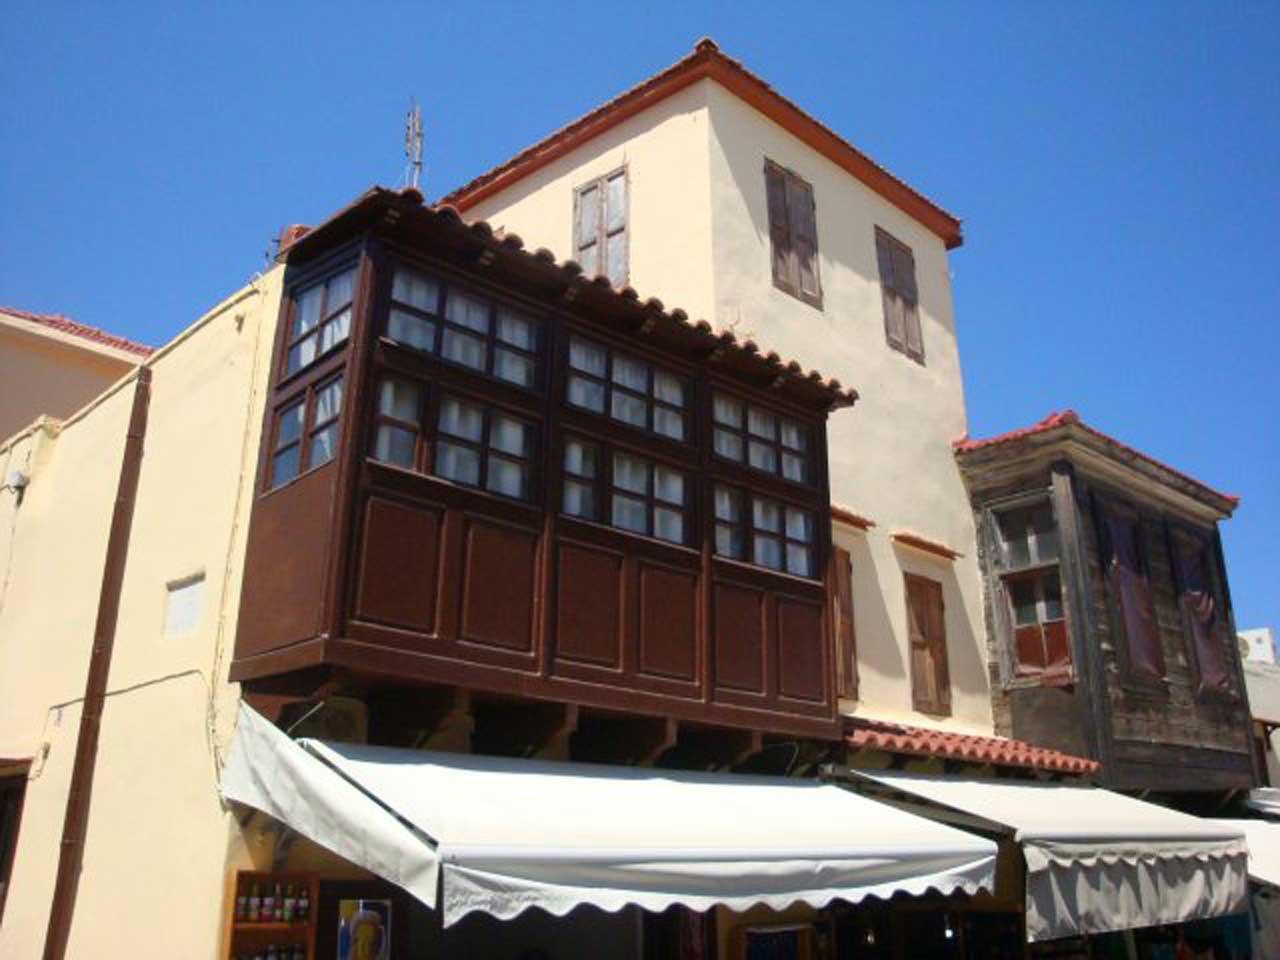 Дома с балконами в турецком квартале Старого горда острова Родос